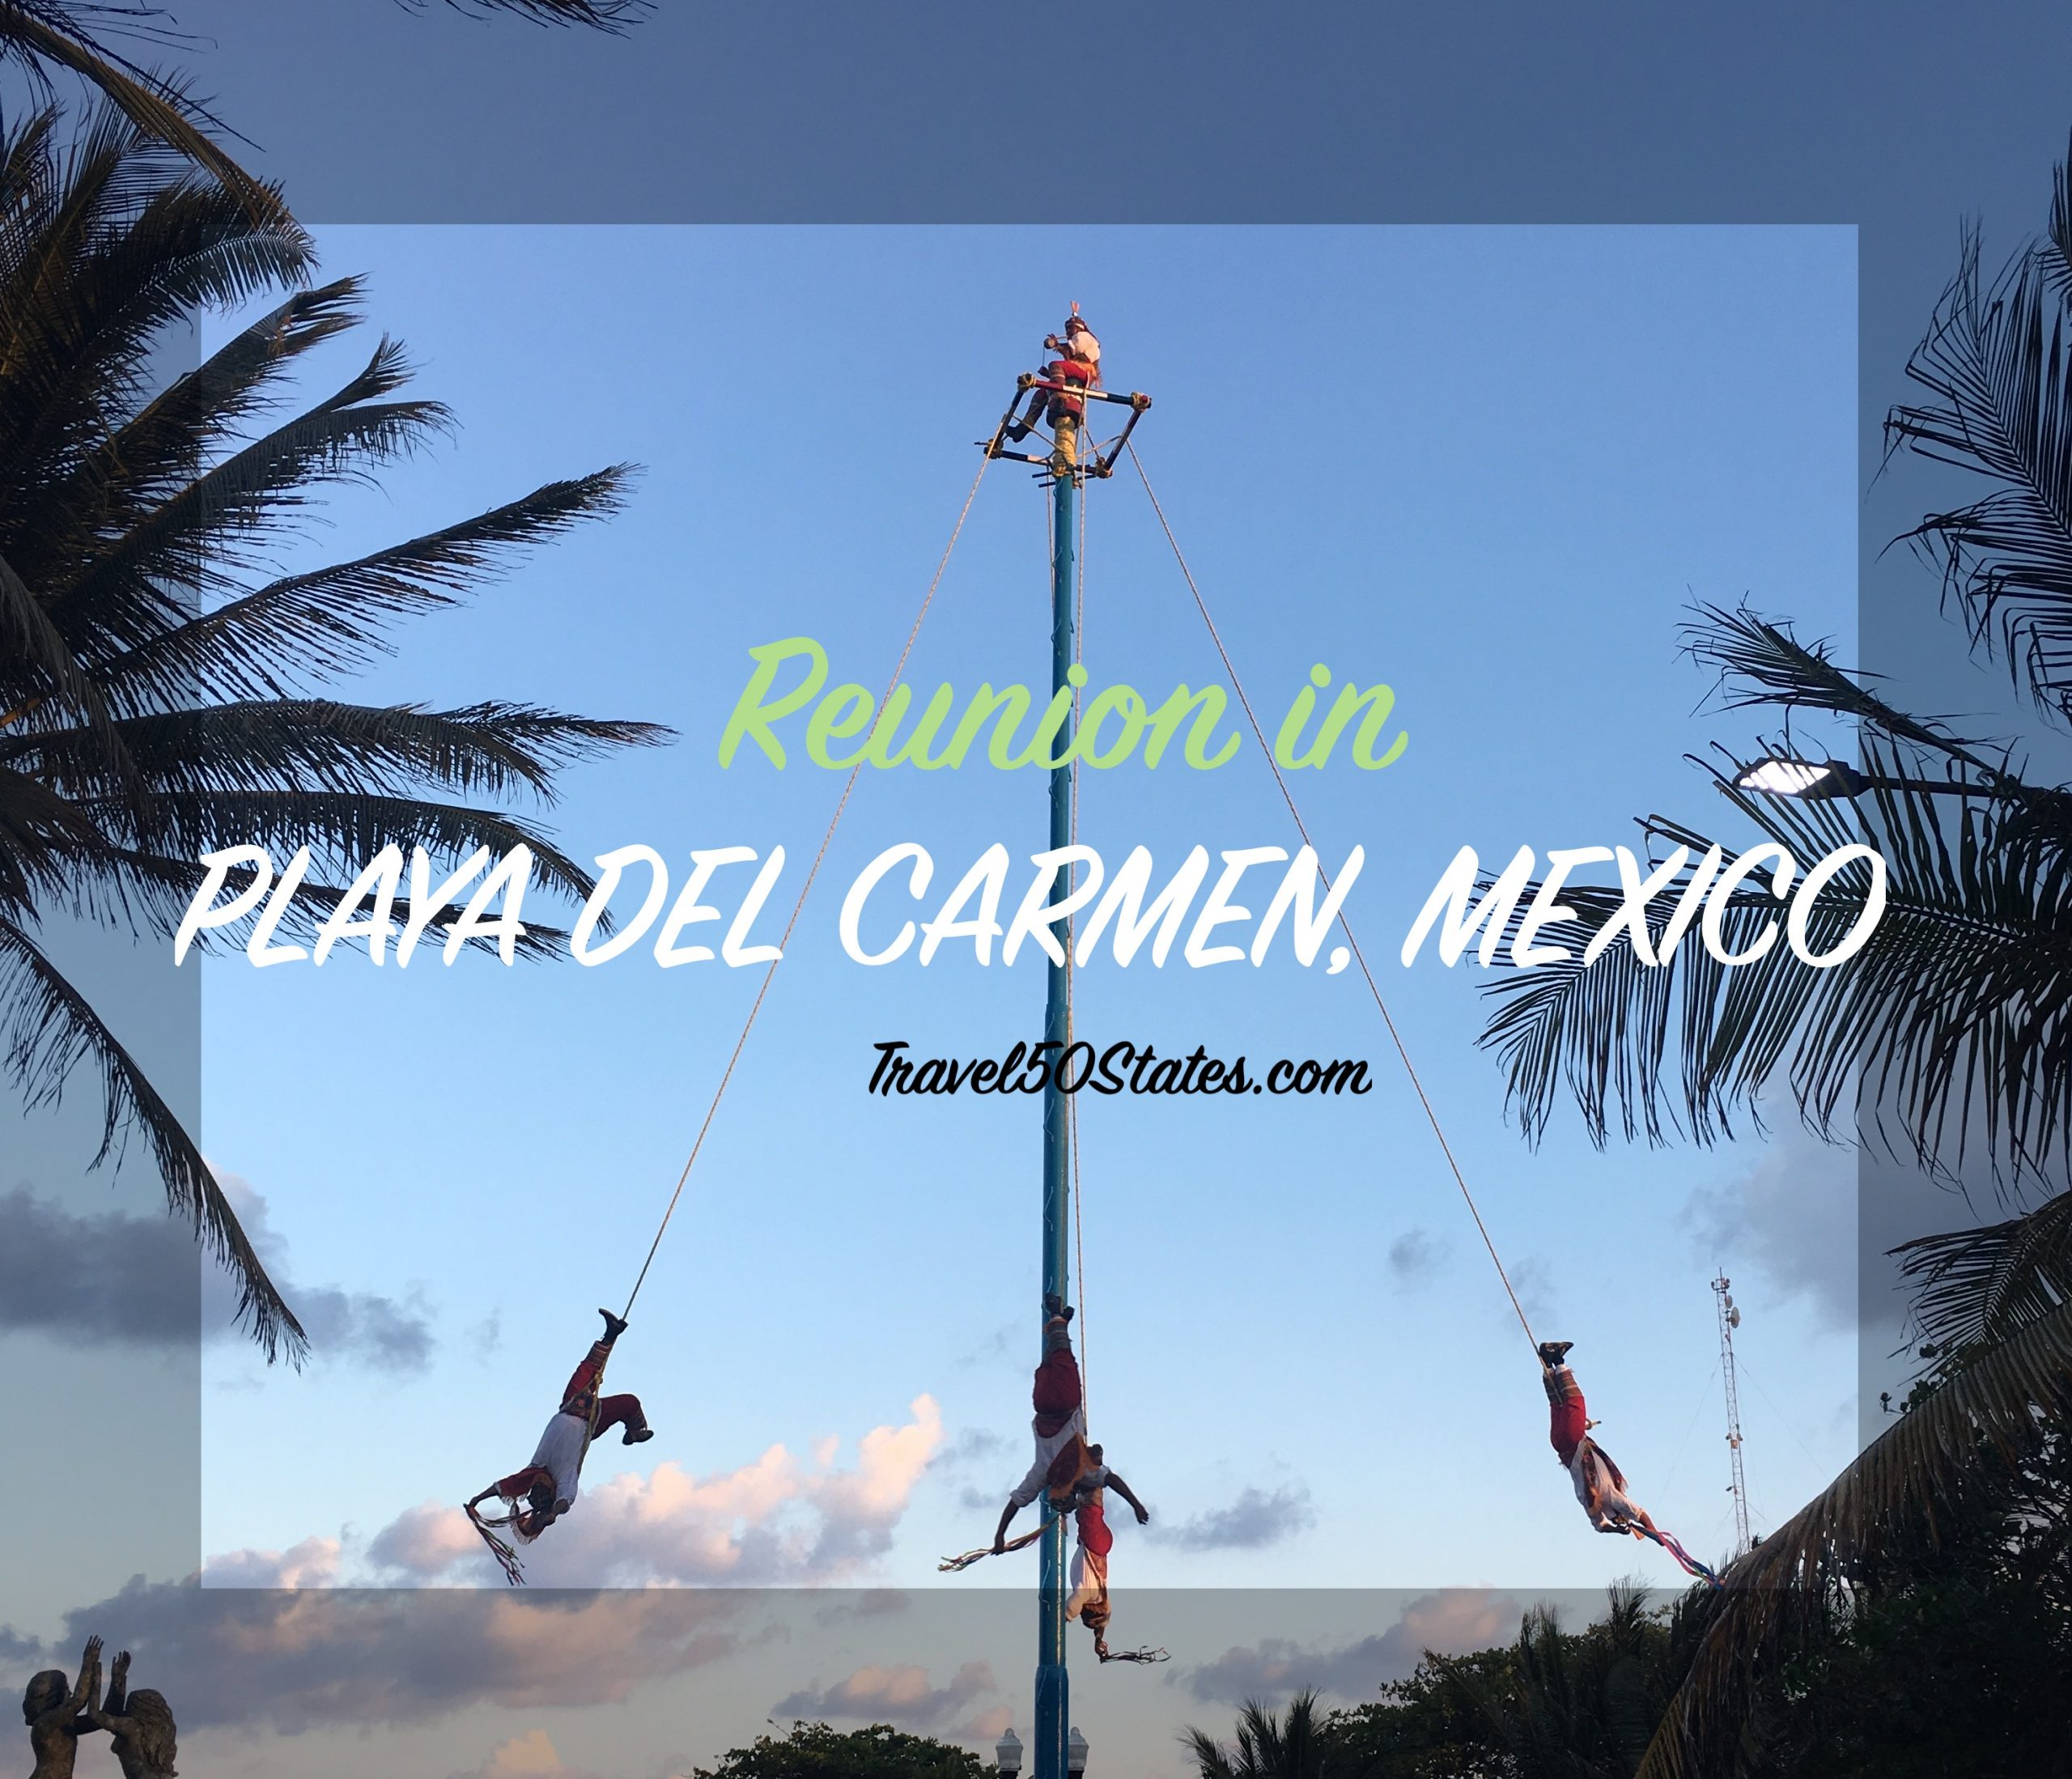 Reunion in Playa Del Carmen and Xpu-Ha, Mexico